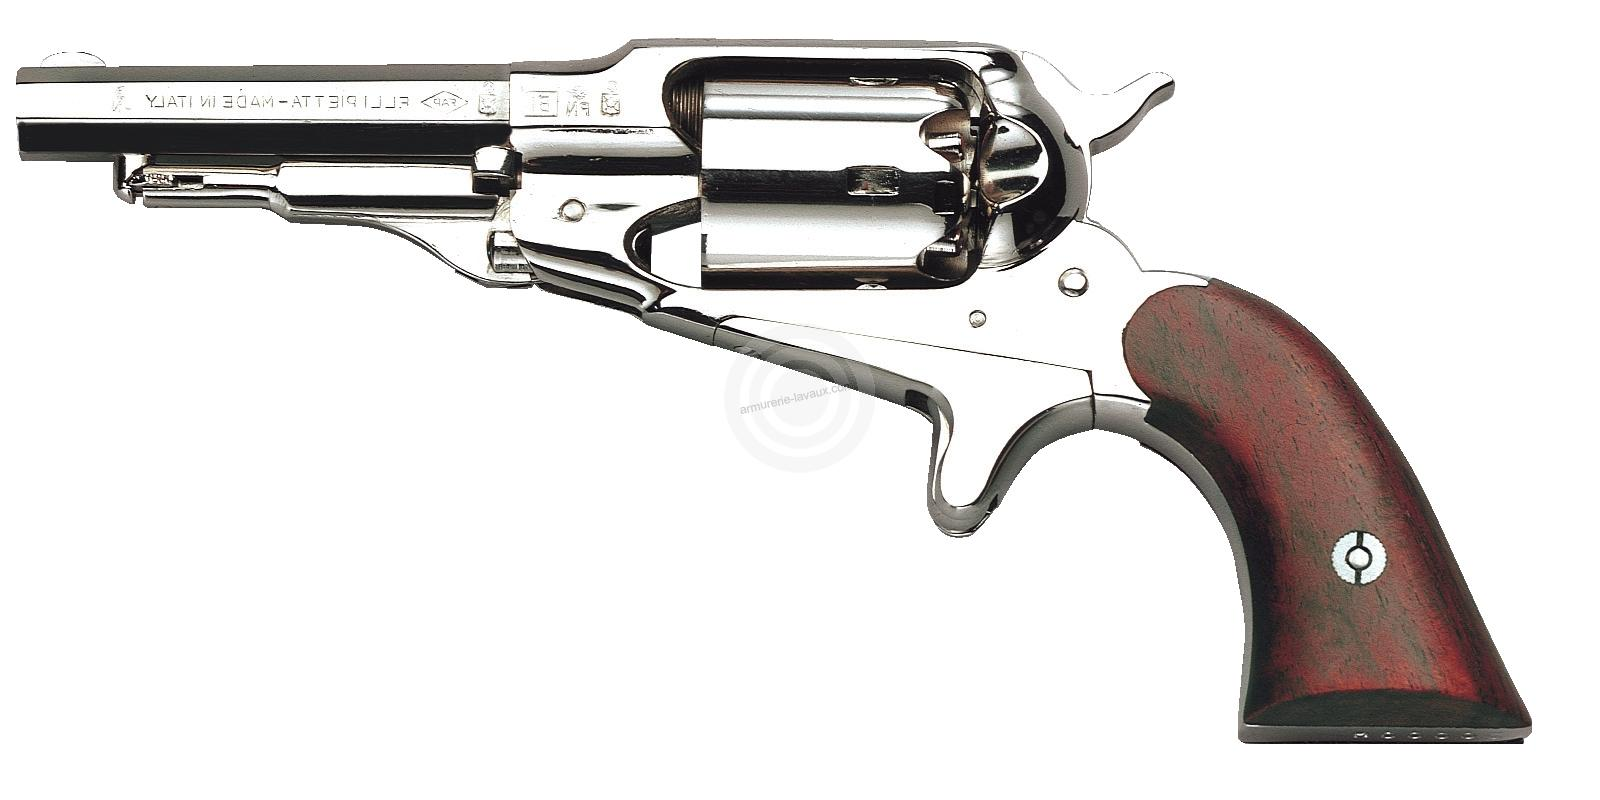 Revolver � Poudre Noire Pietta REMINGTON 1863 Pocket Laiton Nickel� Cal.31